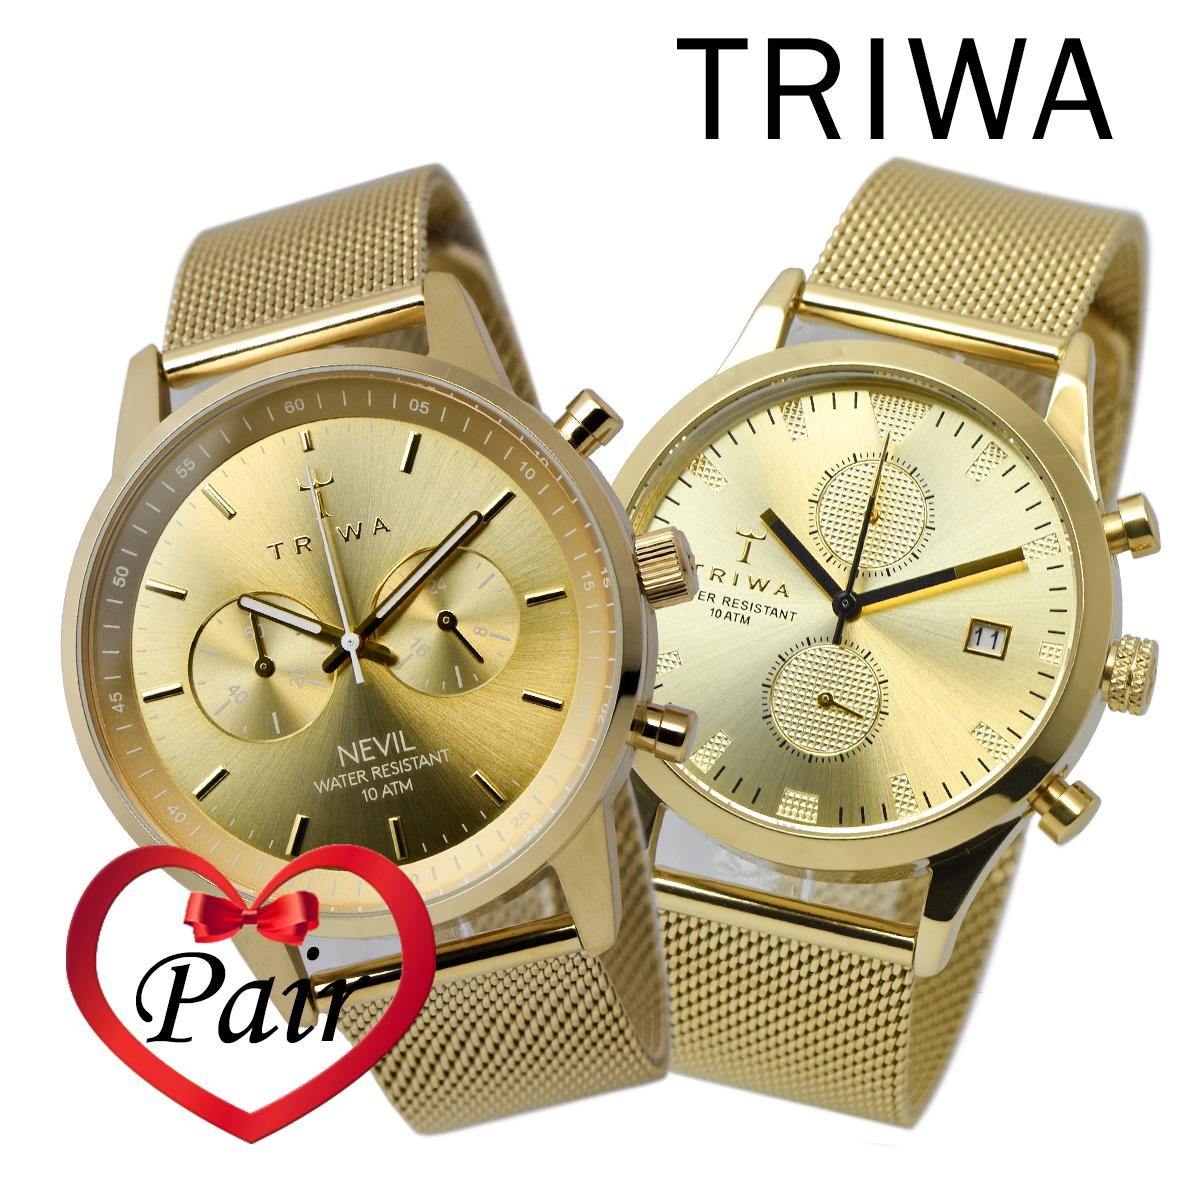 d562e25286 トリワ TRIWA ネヴィル NEVIL,ランセンクロノ Lansen Chrono NEST104-ME021313  LCST109-ME021313 ペア 時計 腕時計 トリワ 海外正規品 送料無料